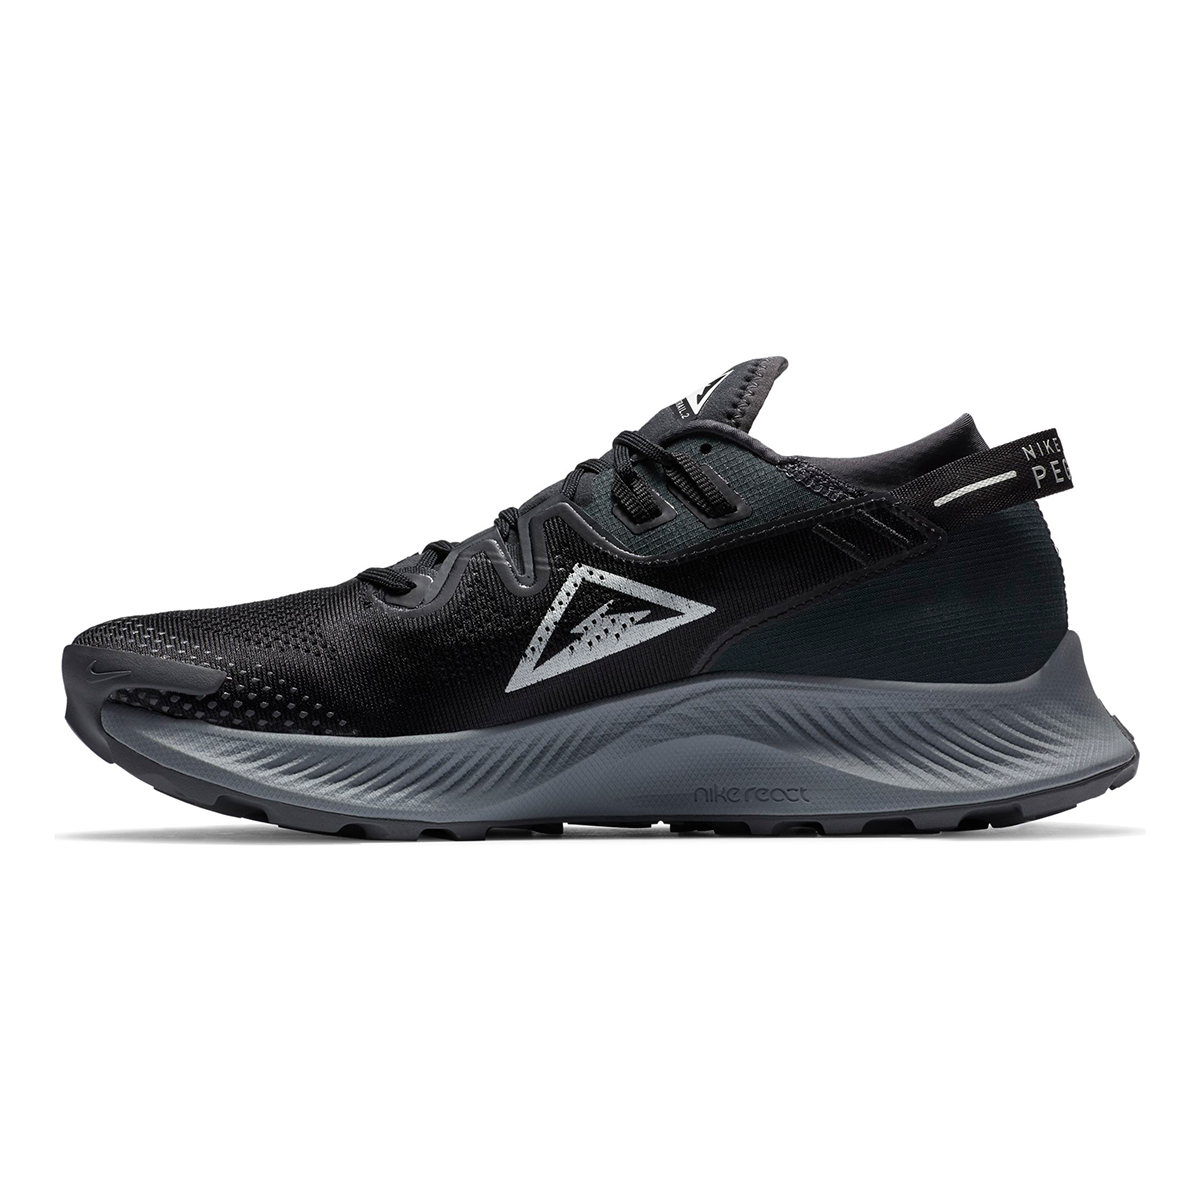 Men's Nike Pegasus Trail 2 Trail Running Shoe - Color: Black/Dark Smoke Grey/Particle Grey/Spruce Aura - Size: 6 - Width: Regular, Black/Dark Smoke Grey/Particle Grey/Spruce Aura, large, image 4